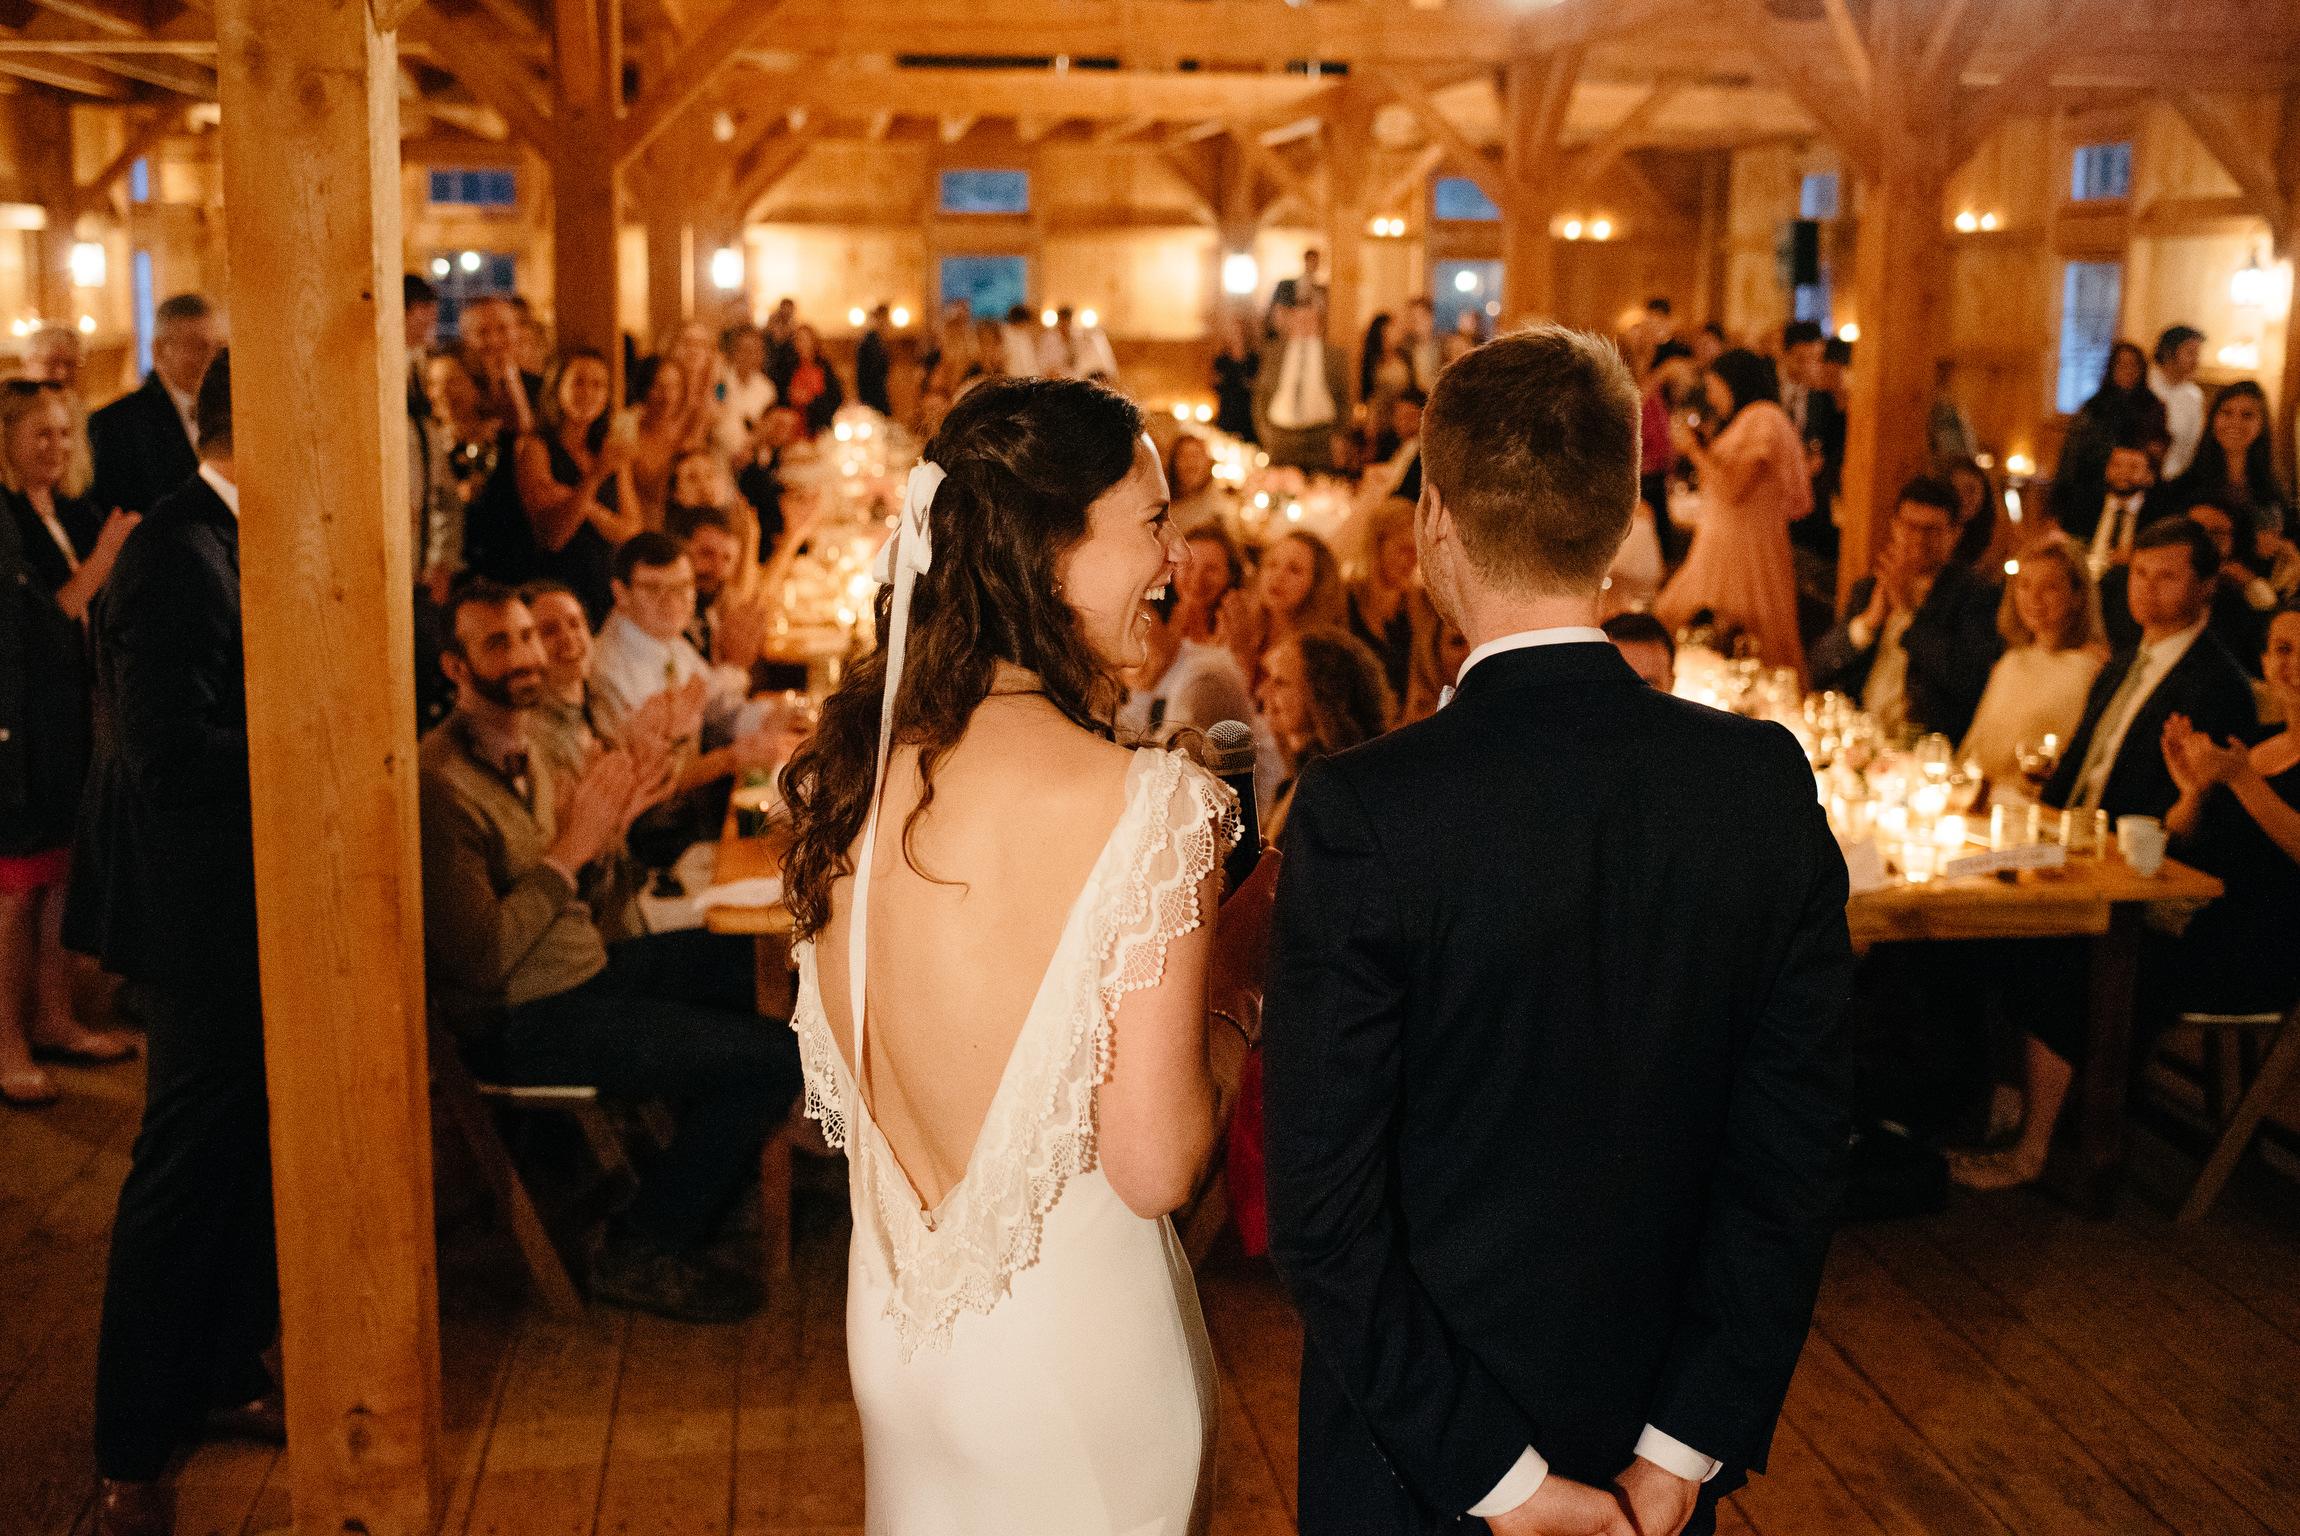 vermont_farm_wedding_photos_mikhail_glabetS_60.JPG